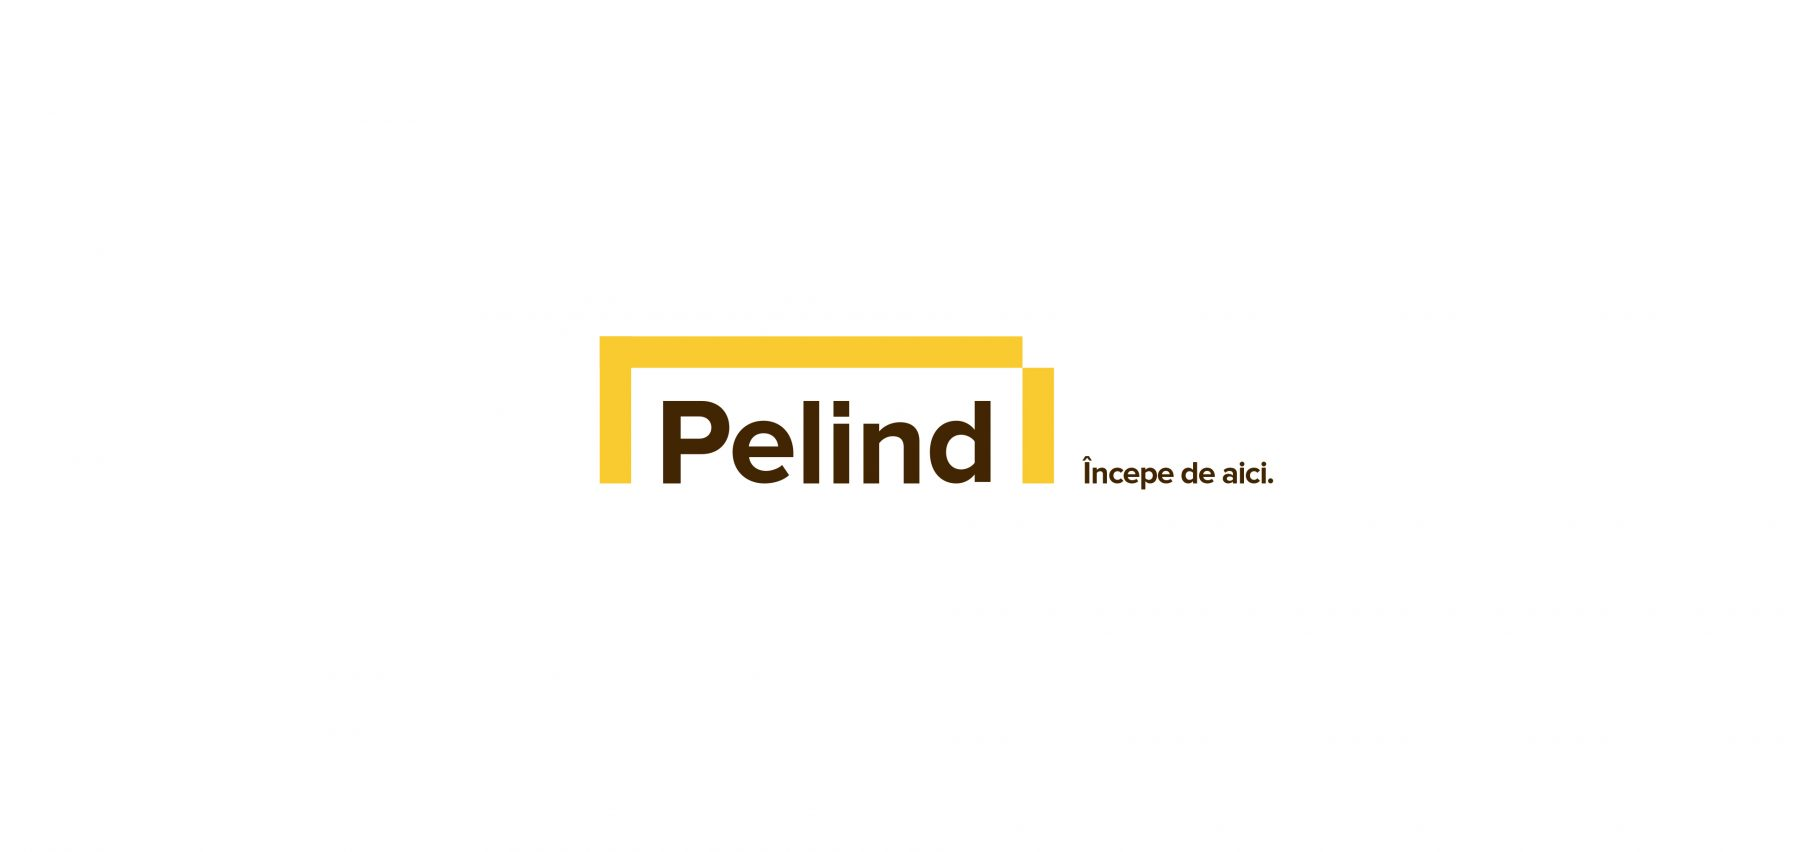 Pelind logo design | Rebranding